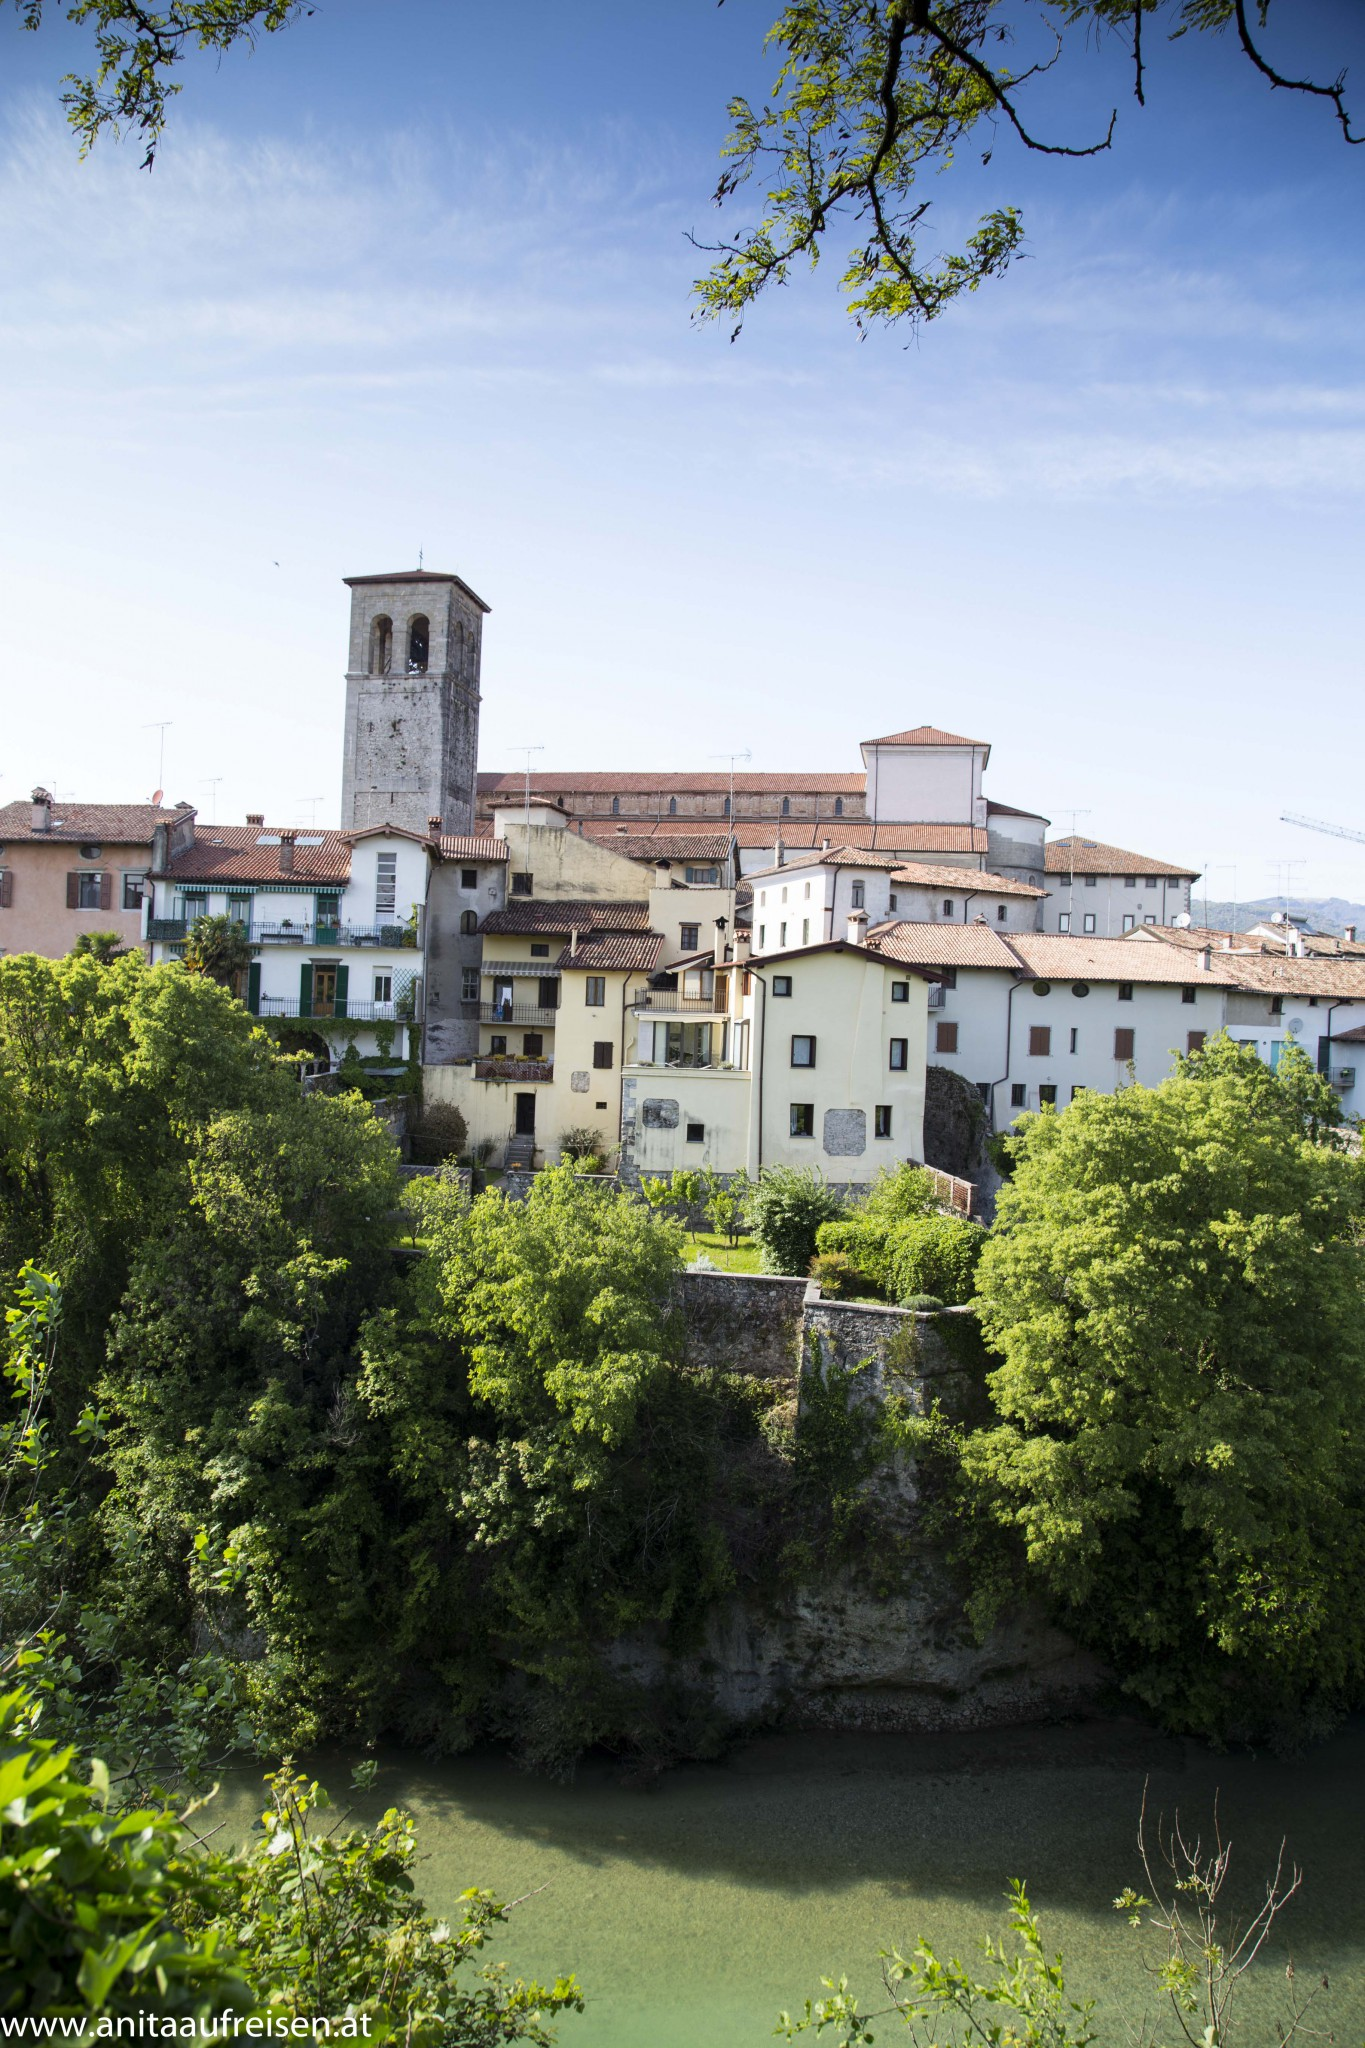 Cividale del Friuli, Italien, Foto Anita Arneitz, www.anitaaufreisen.at